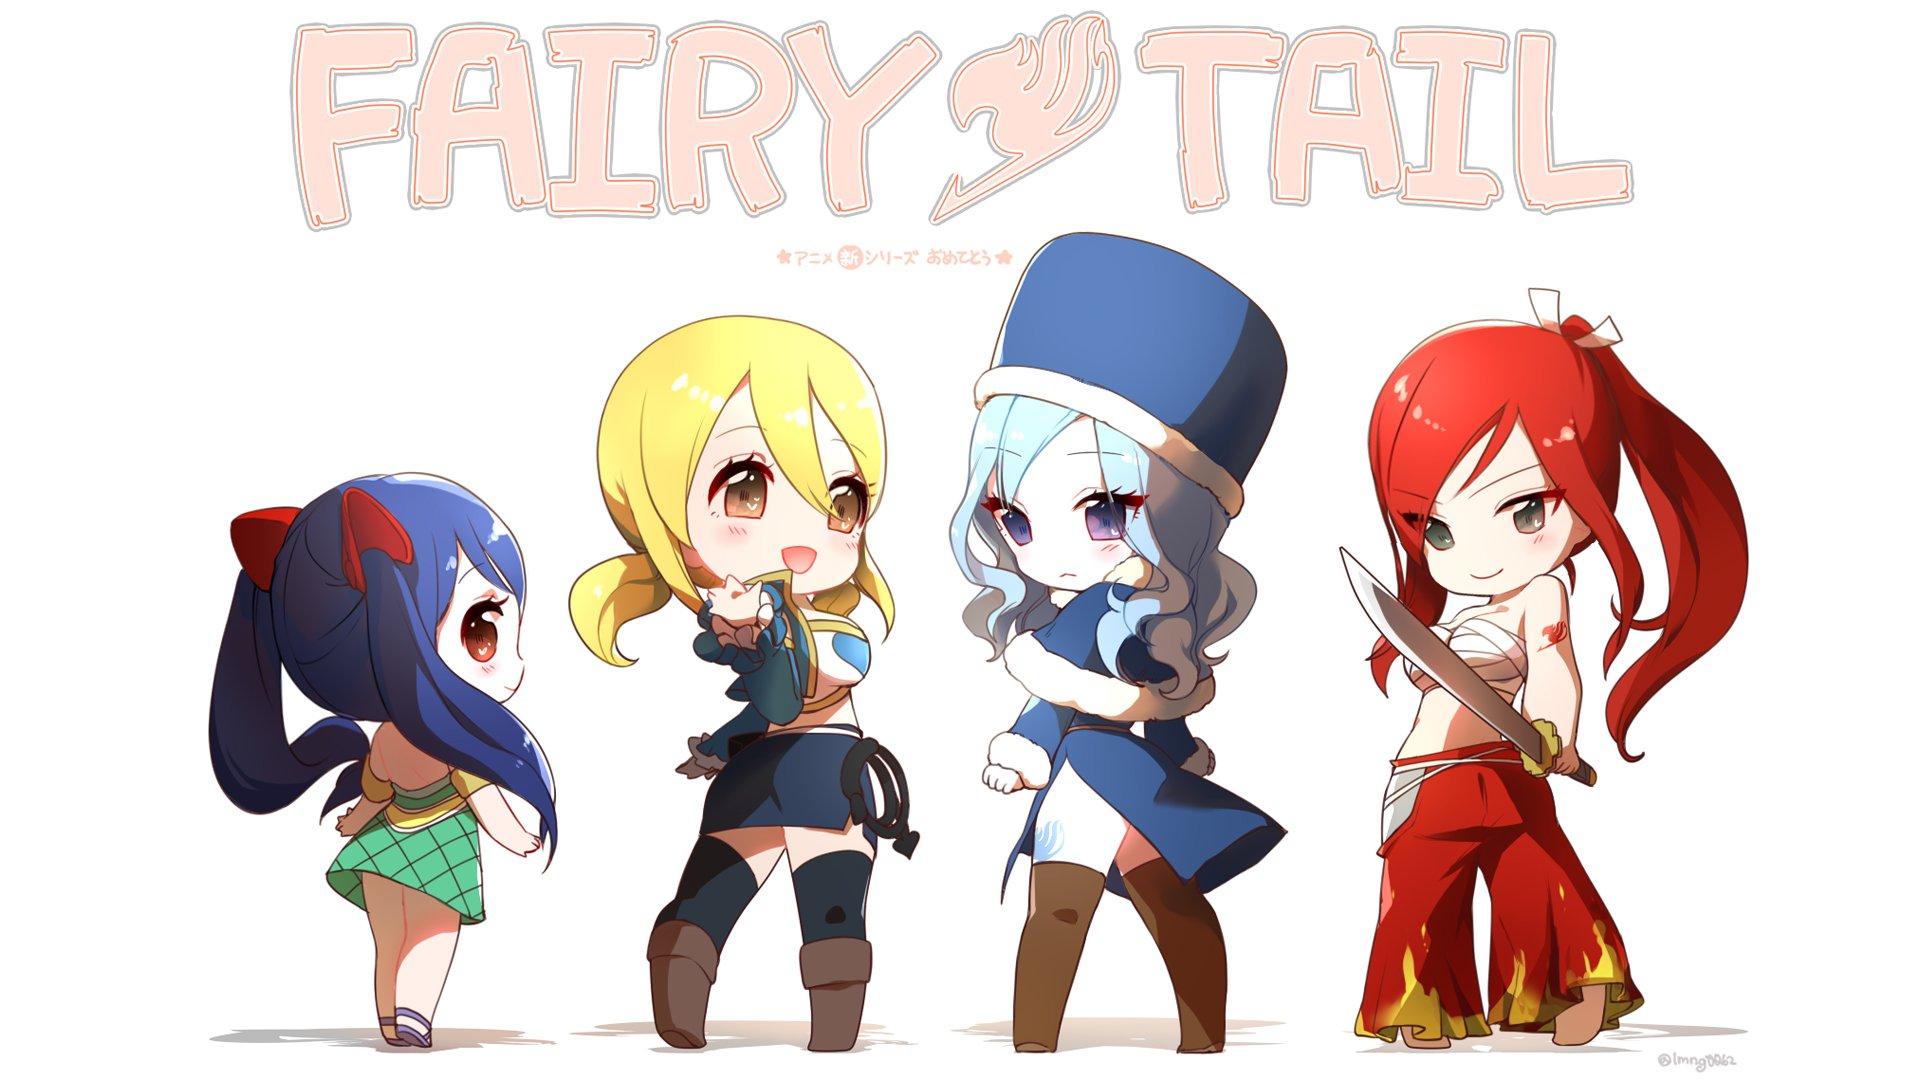 chibi anime girls fairy tail wendy marvell lucy heartfilia juvia 1920x1080